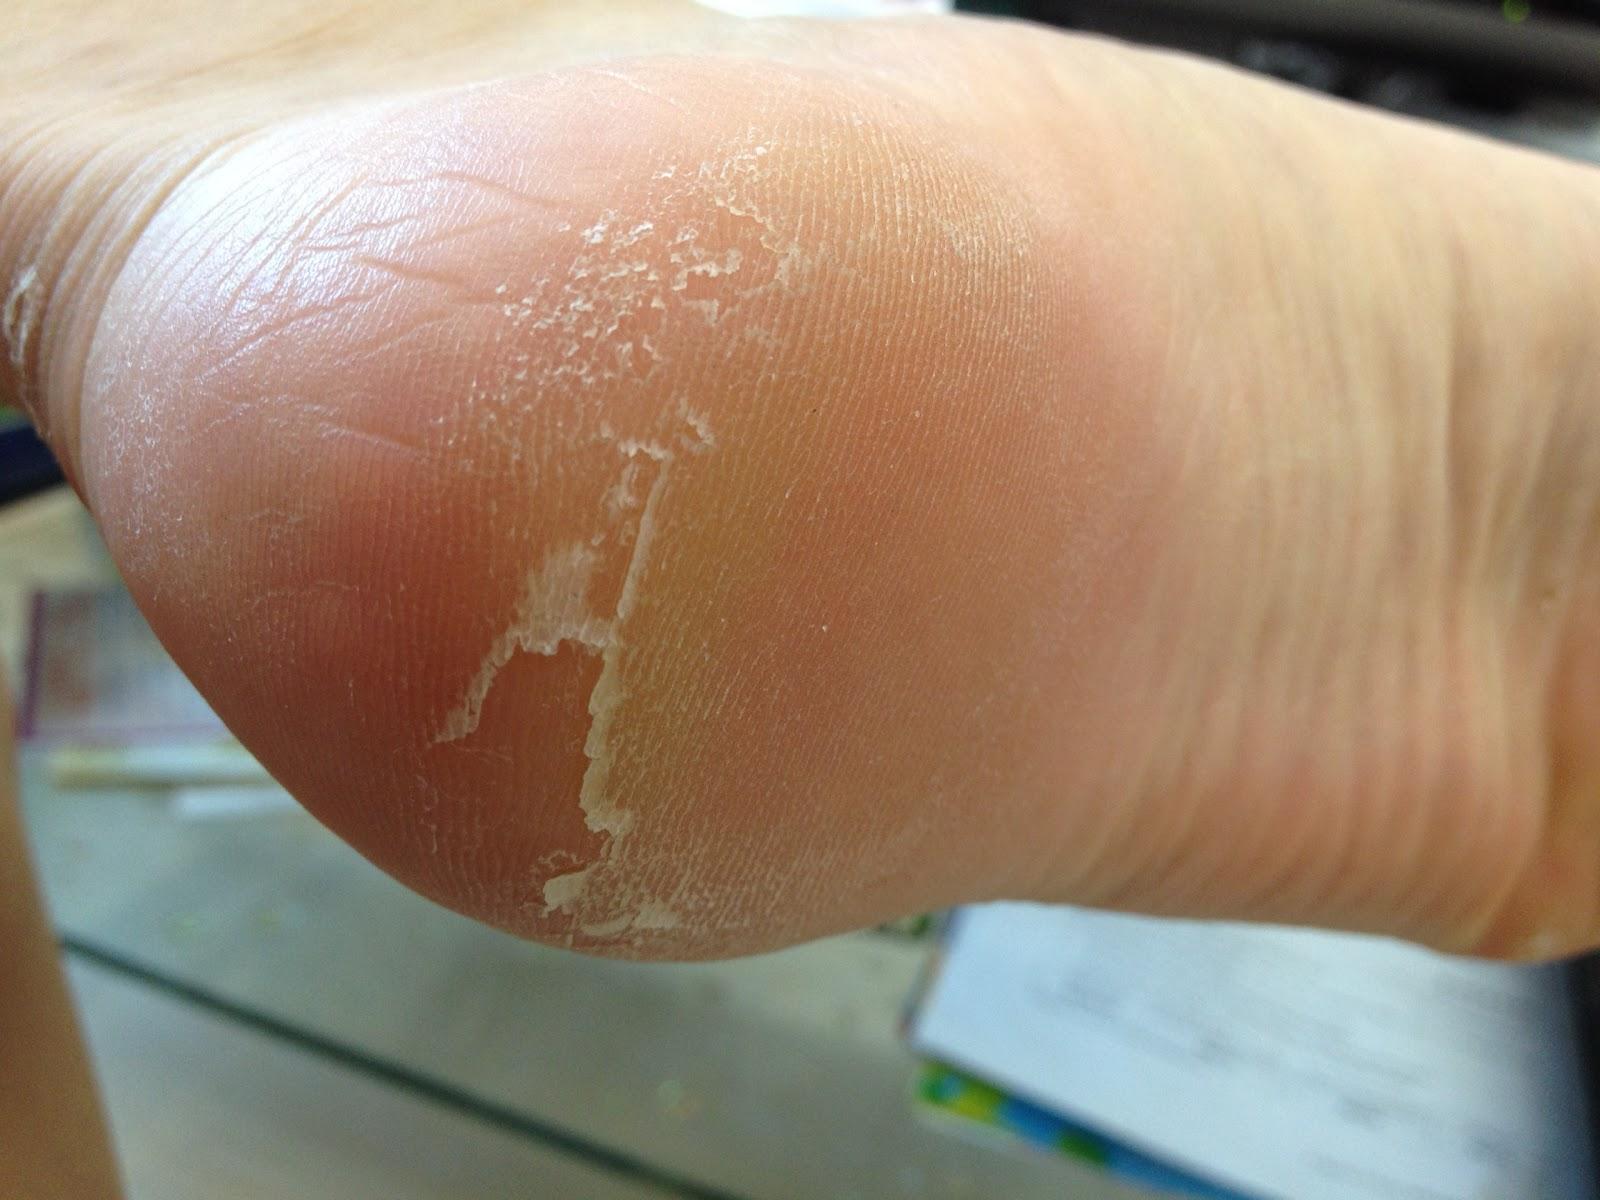 causes of peeling skin on feet